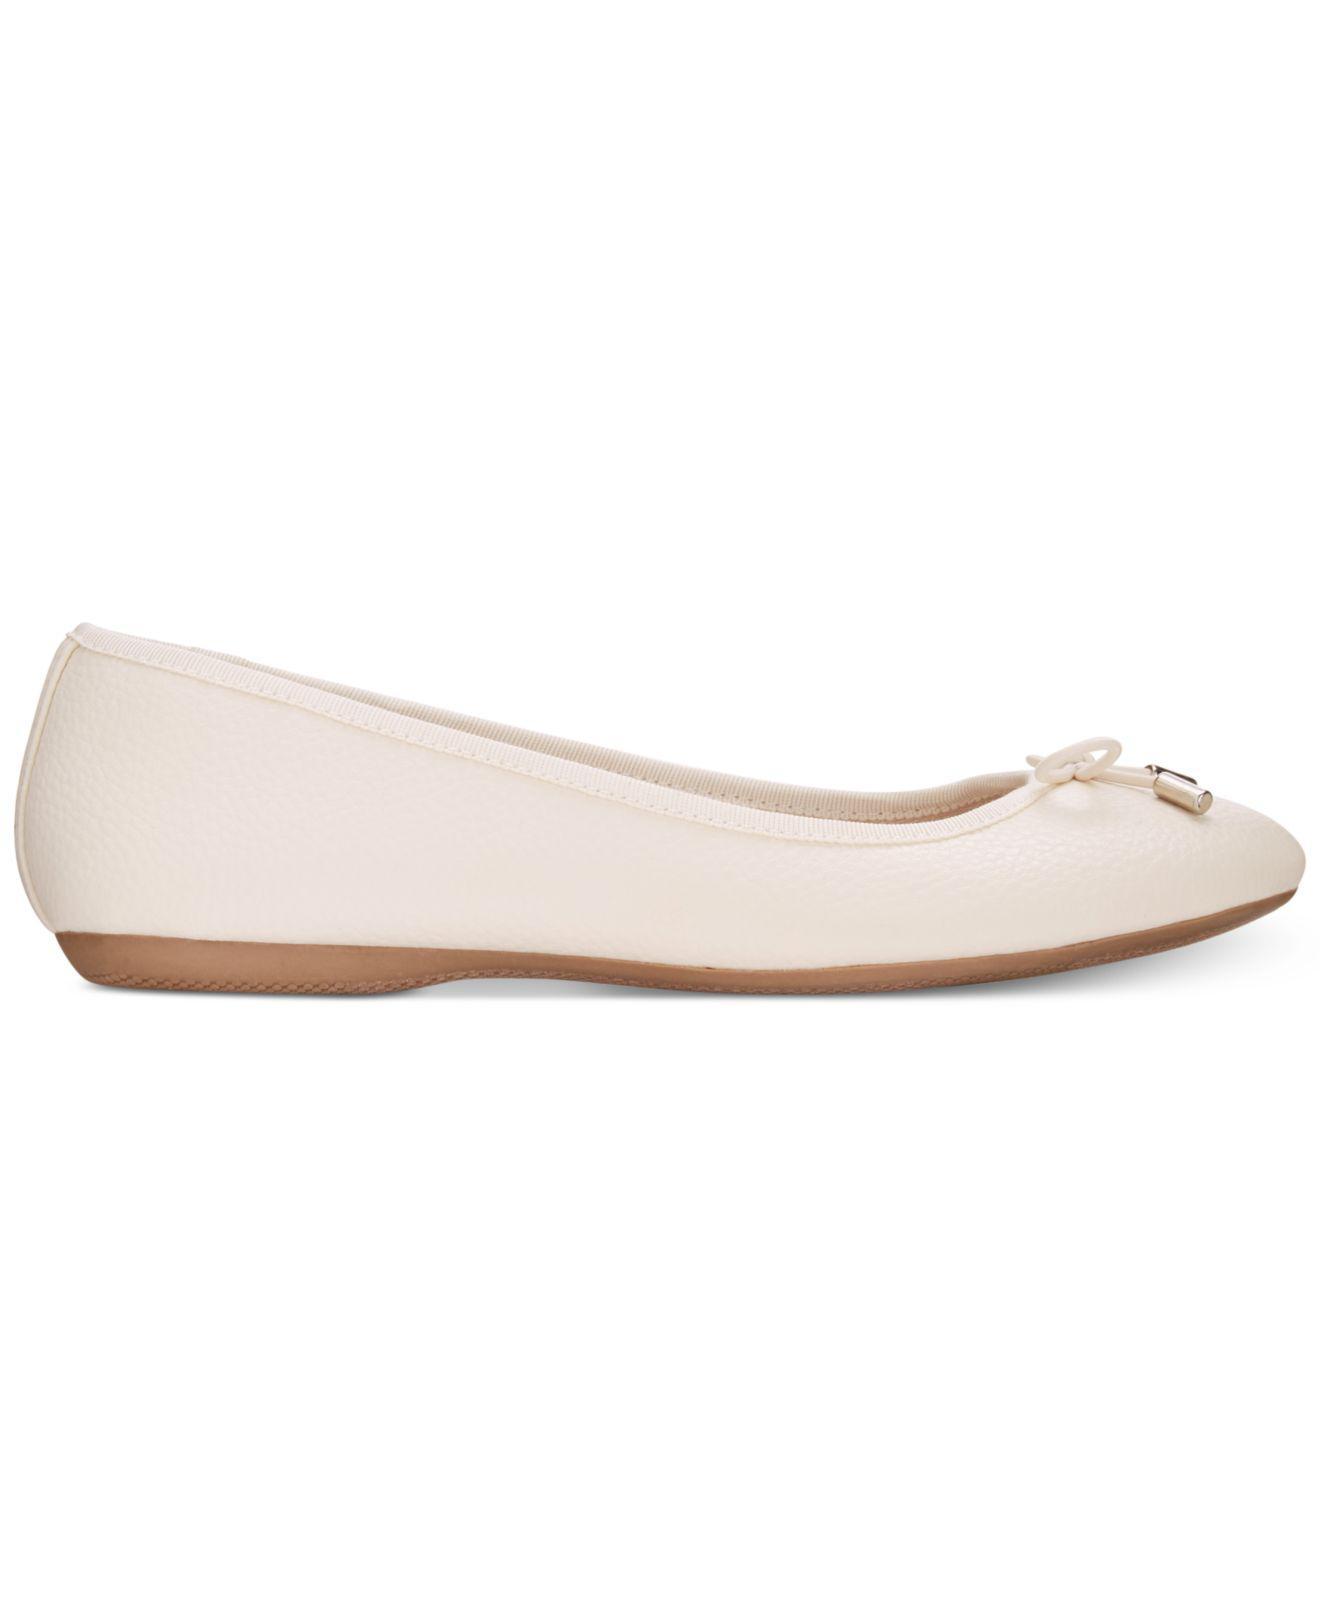 Alfani Women s Aleaa Ballet Flats - Save 64.42307692307692% - Lyst 96211ef44b8ab